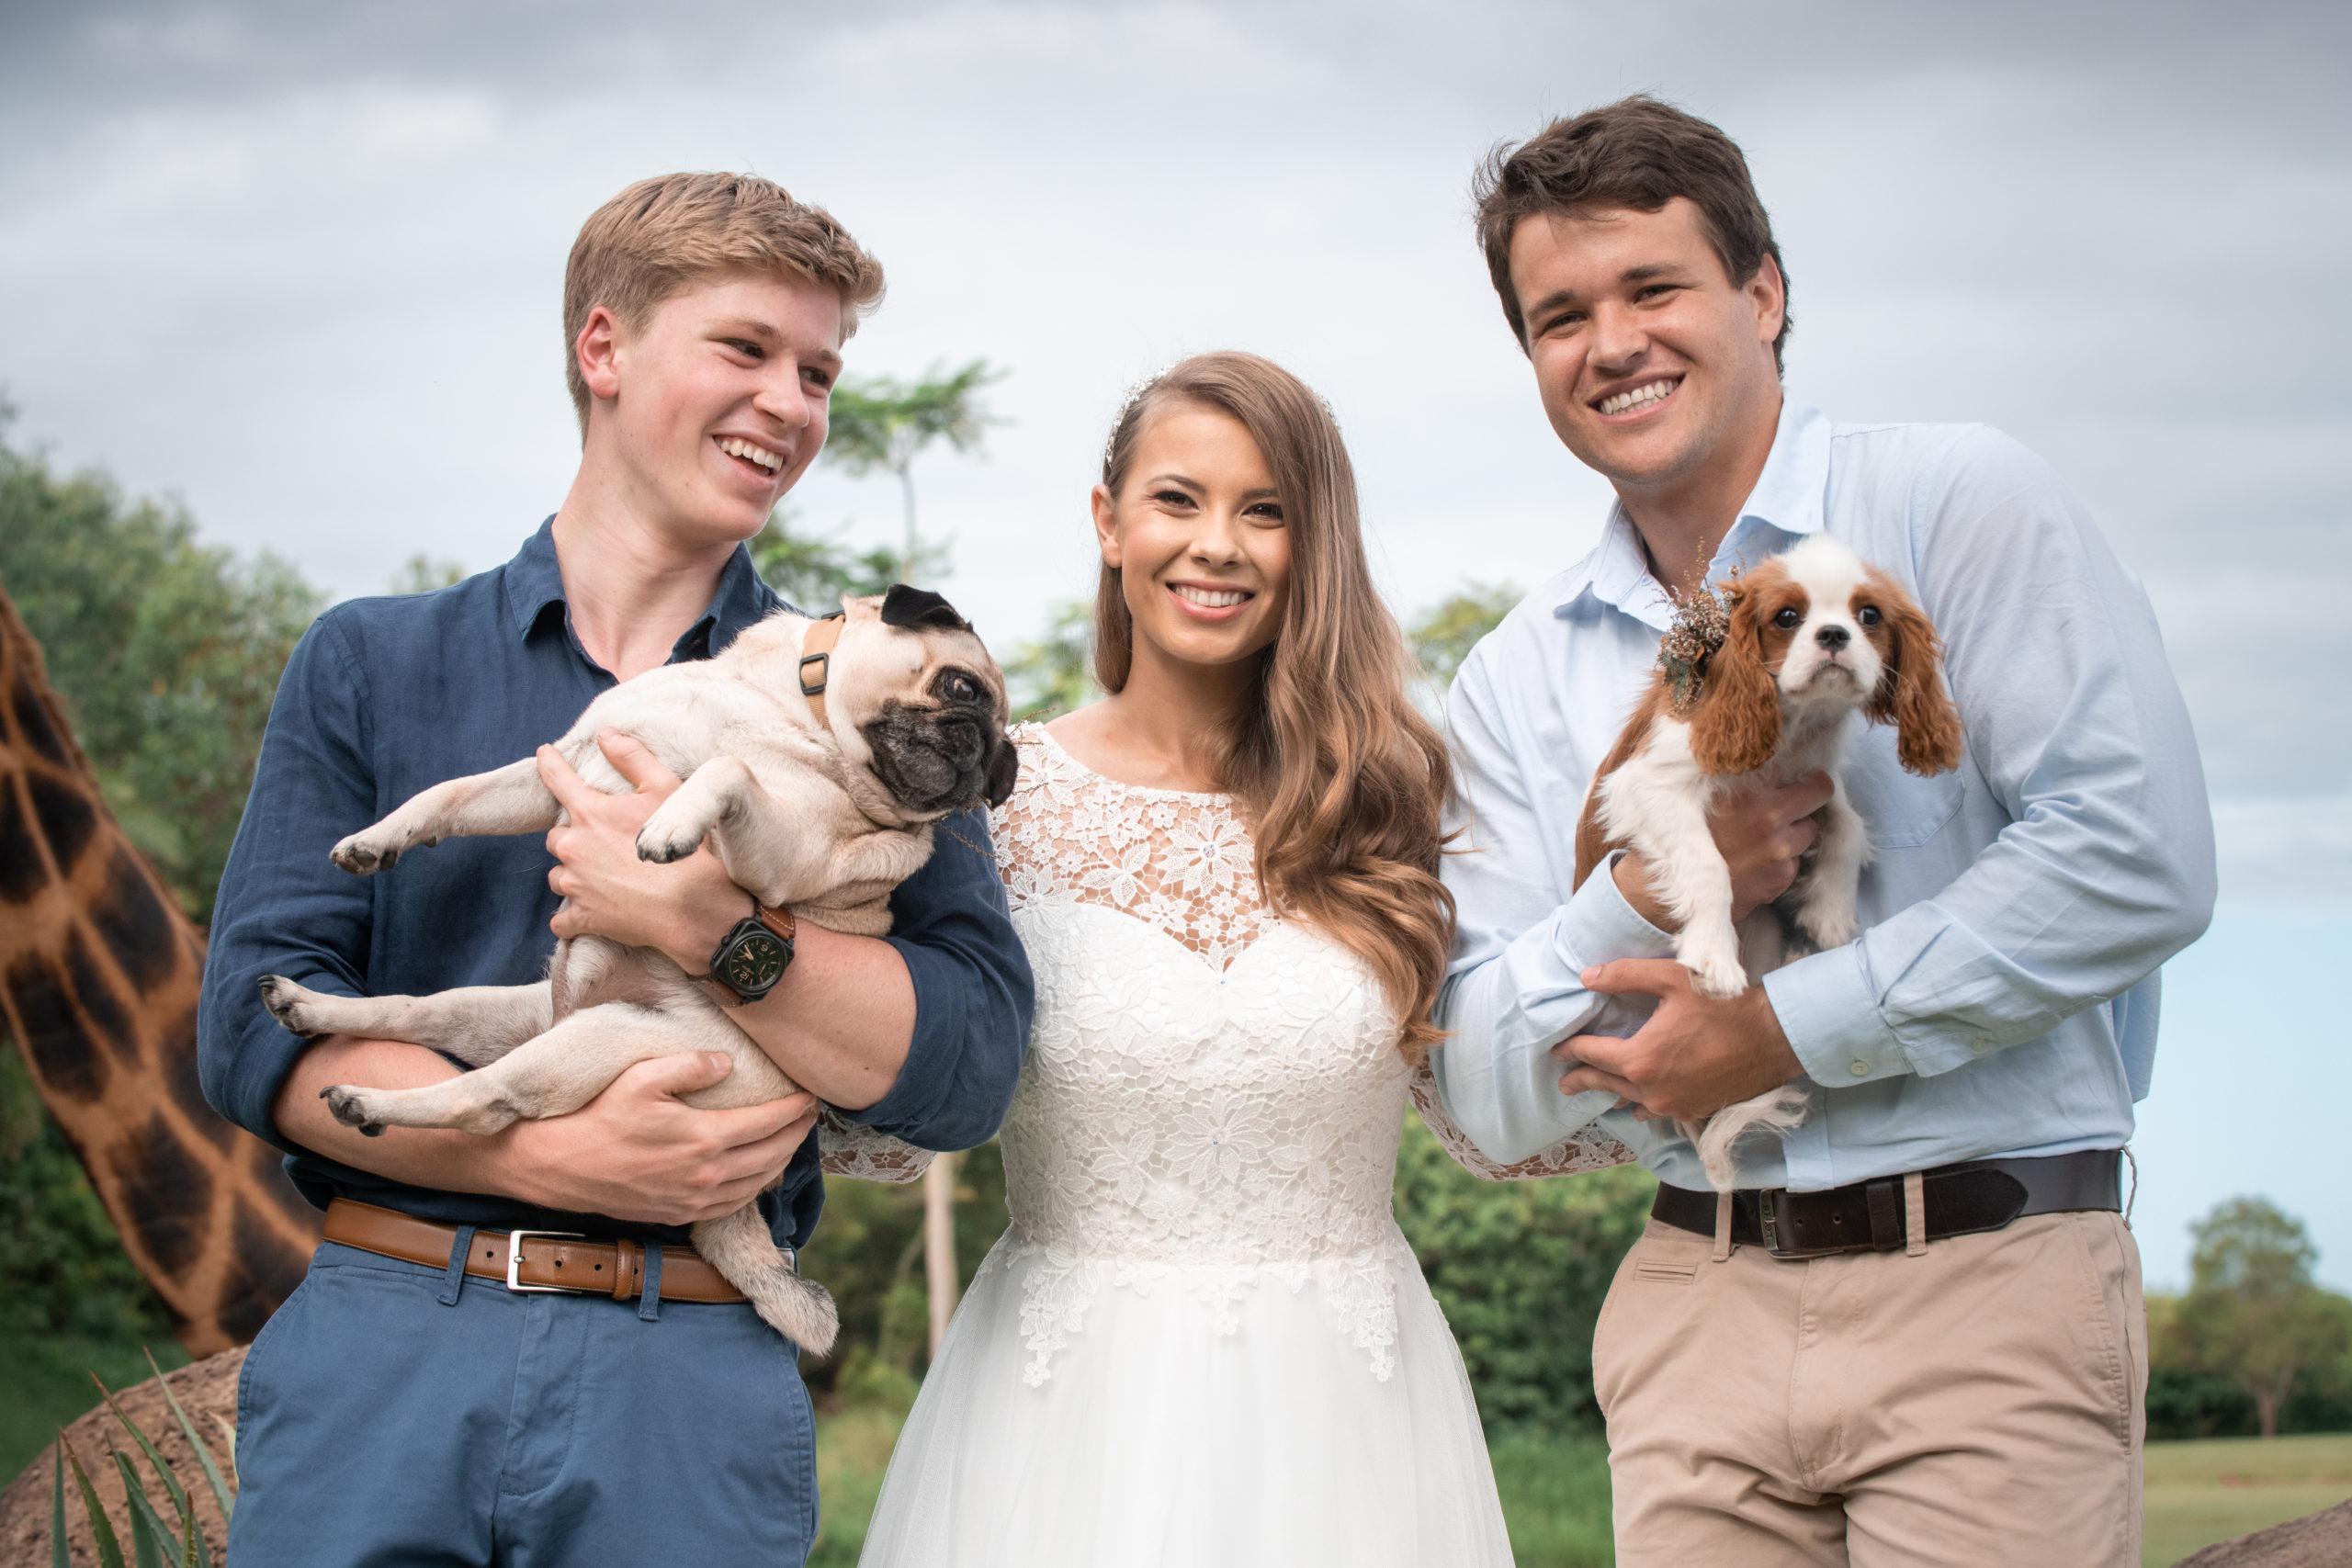 Bindi Irwin's Wedding Special to Air on Animal Planet